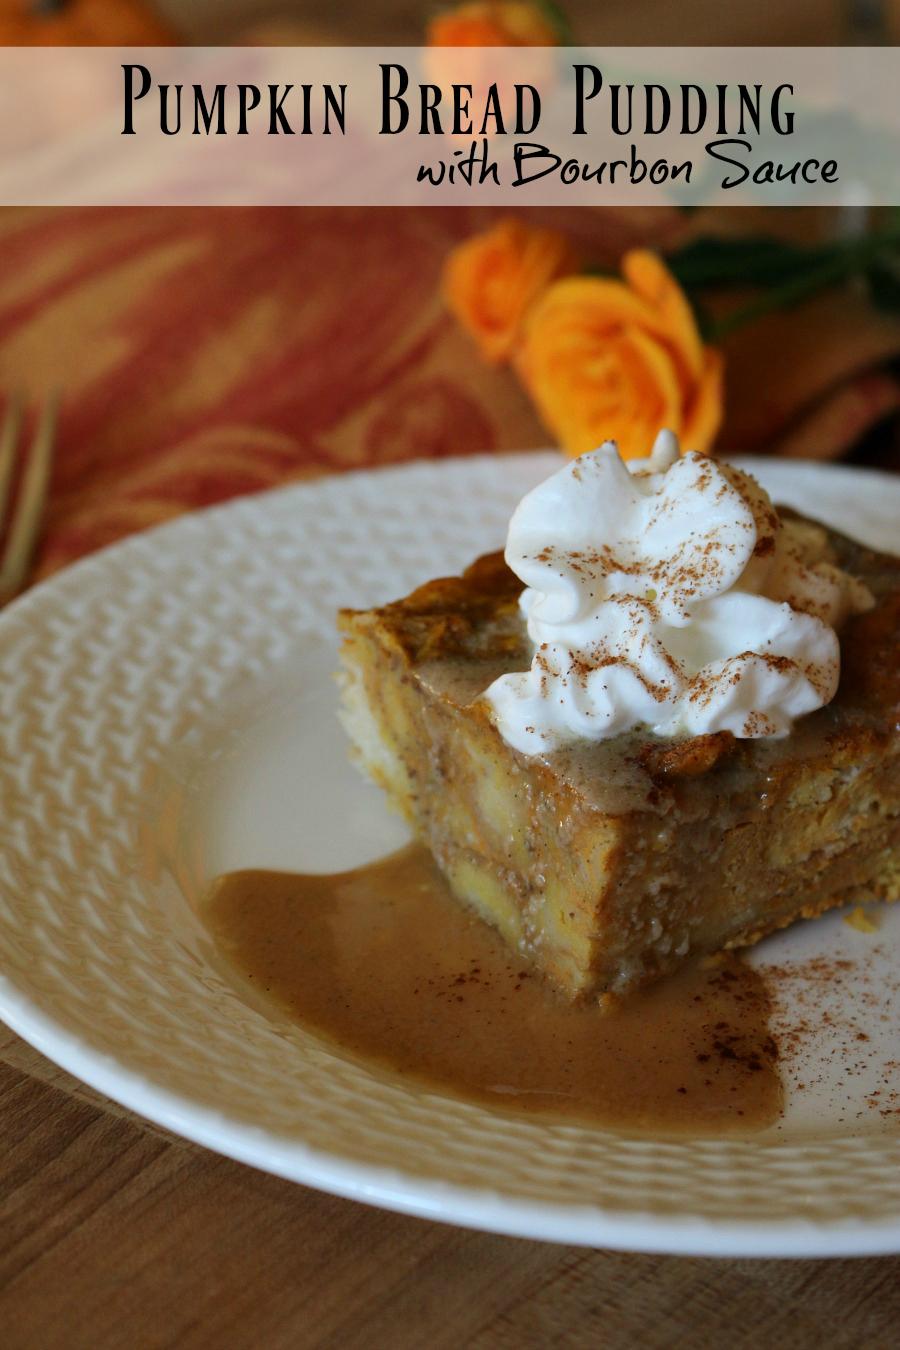 The most amazing Thanksgiving Dessert - Pumpkin Bread Pudding with Bourbon Sauce